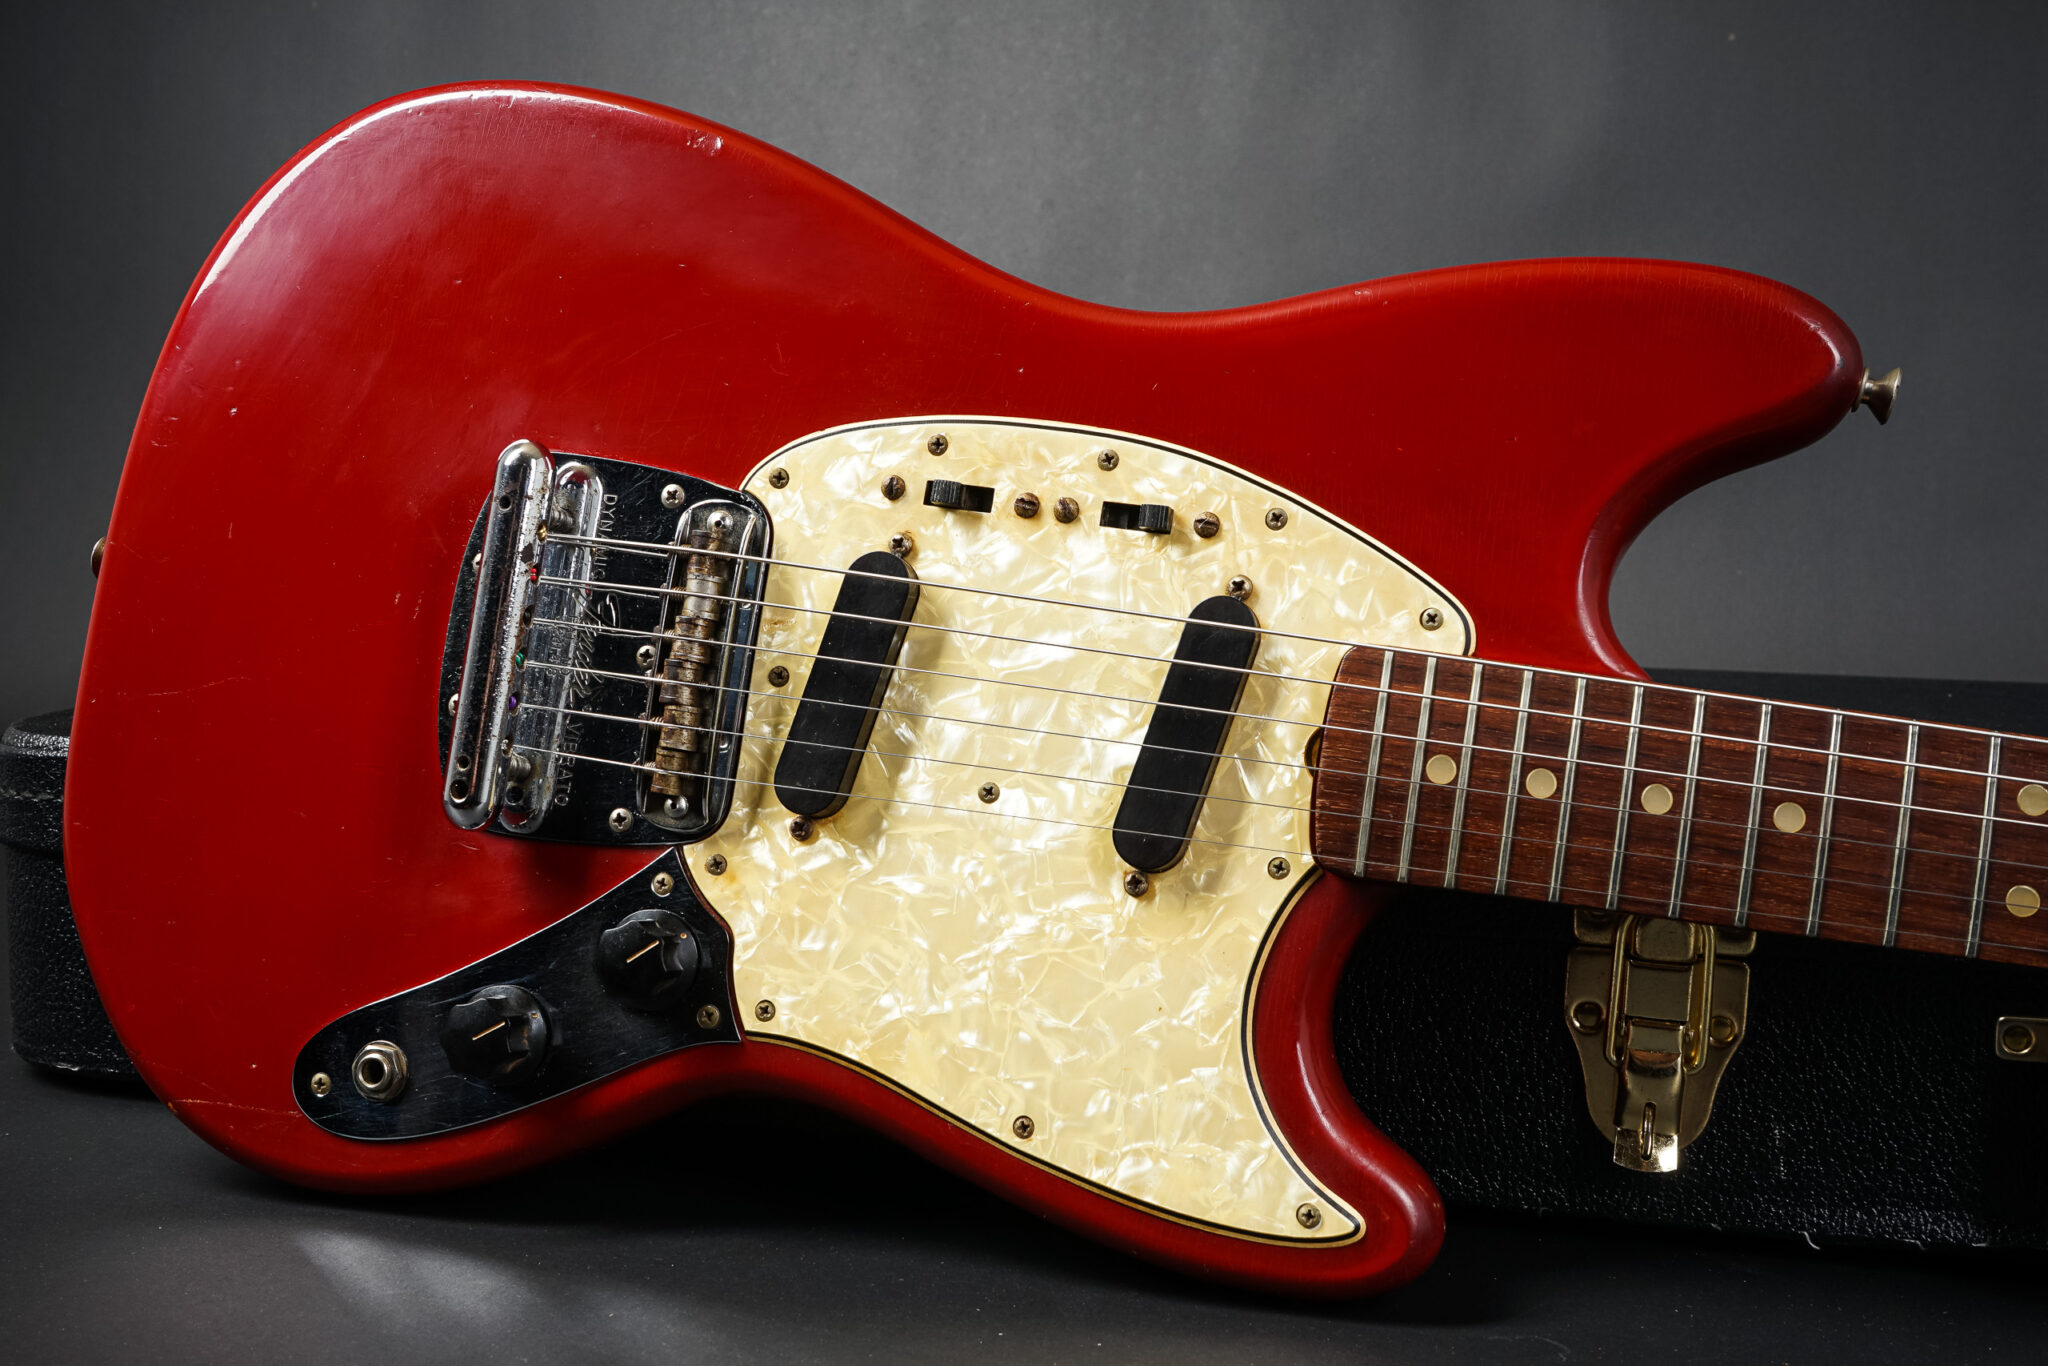 https://guitarpoint.de/app/uploads/products/1966-fender-mustang-red/1966-Fender-Mustang-Red-166310-9-2048x1366.jpg